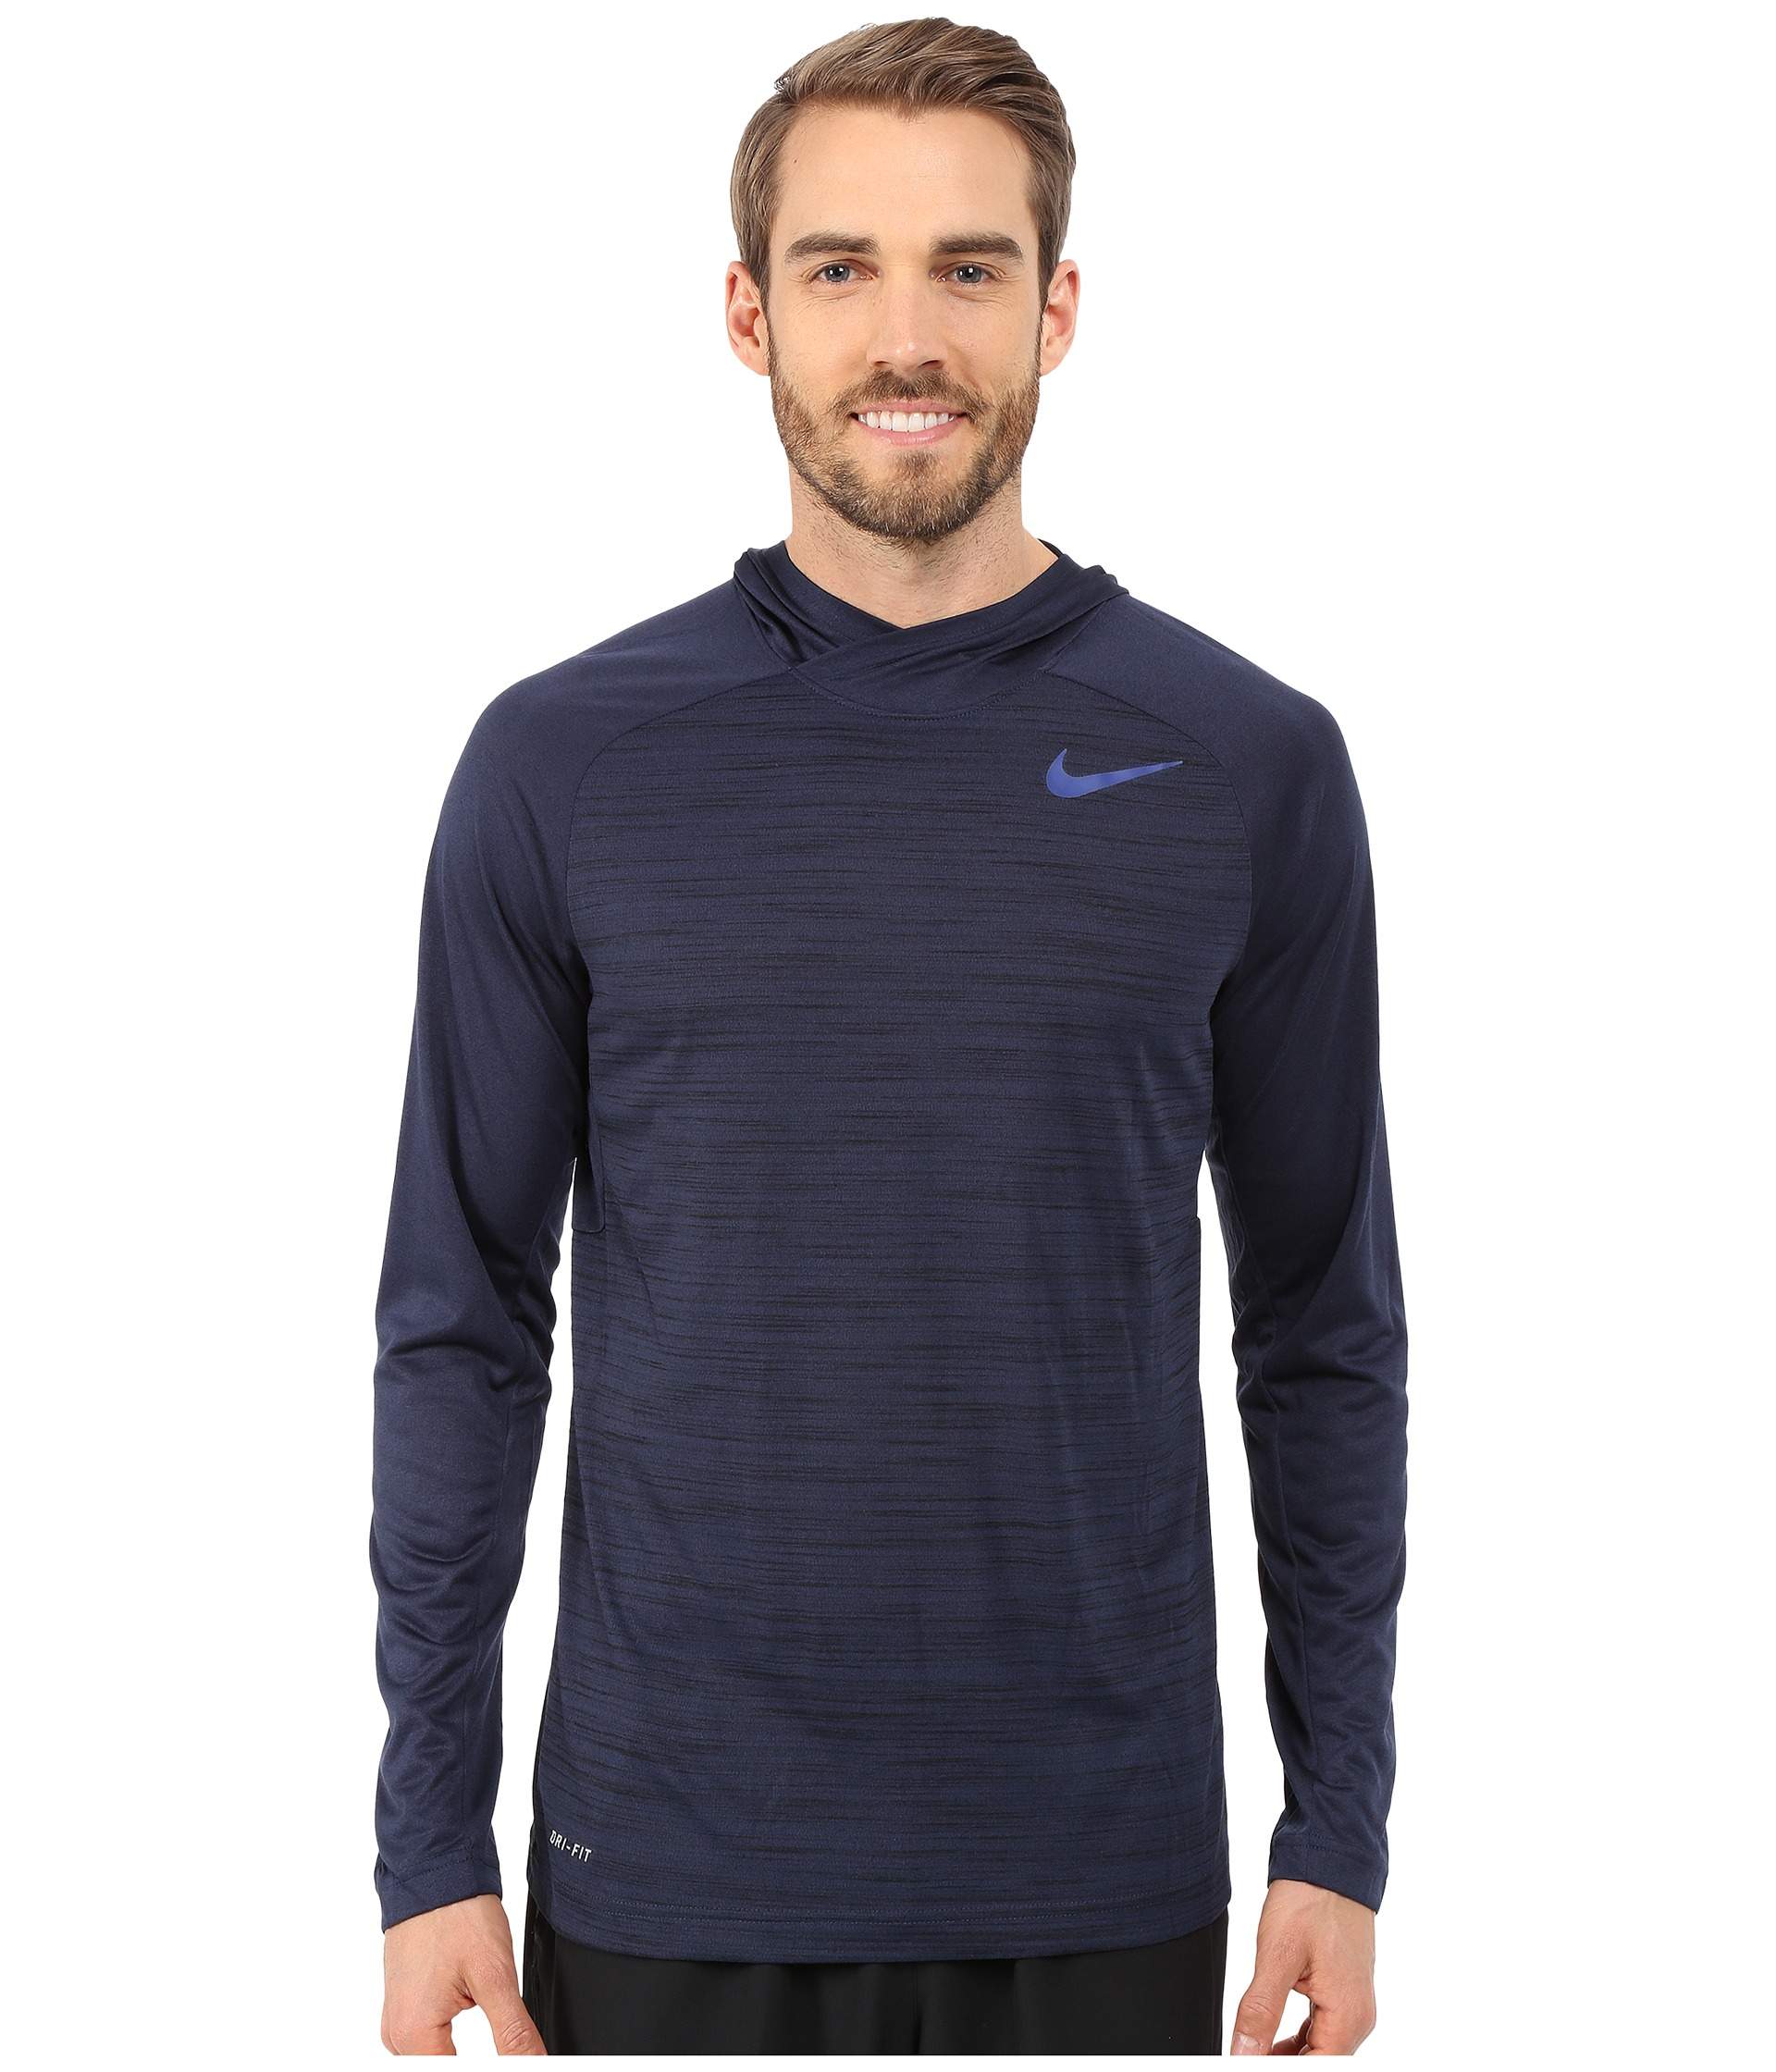 21a8f970 Nike Mens Dri Fit Touch Hooded Long Sleeve Shirt - DREAMWORKS